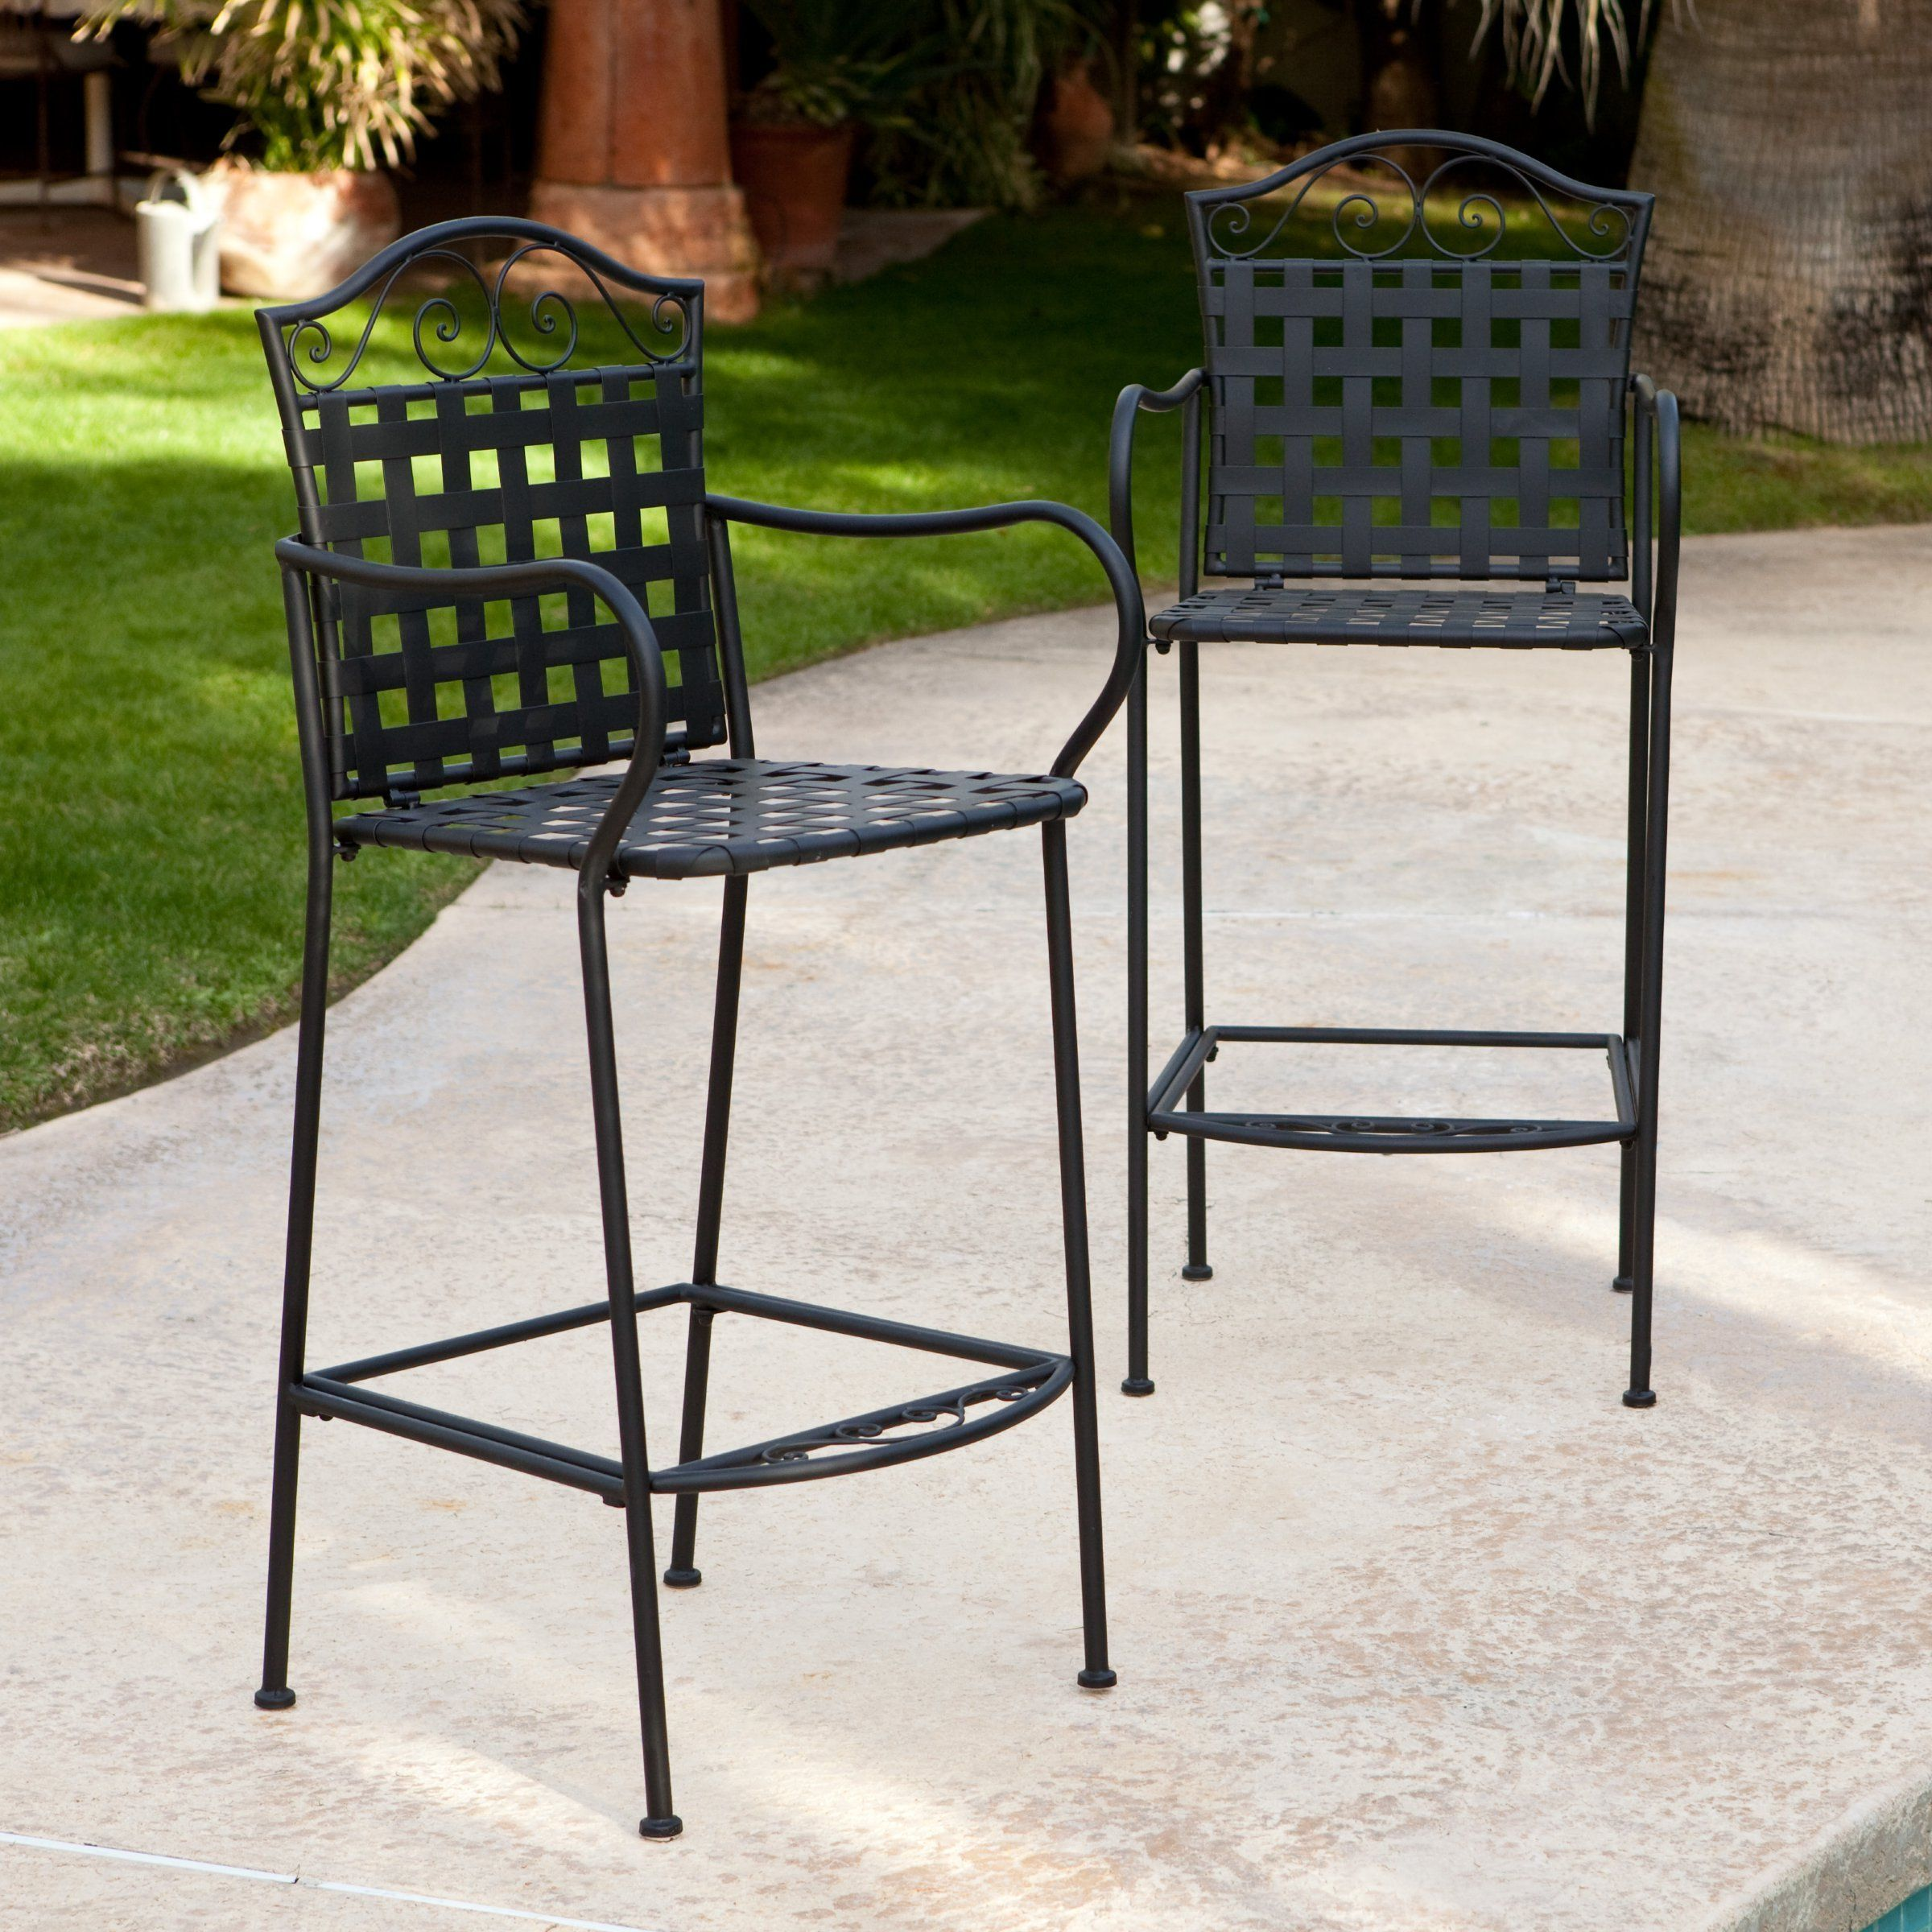 Woodard capri wrought iron outdoor bar stool set of seat